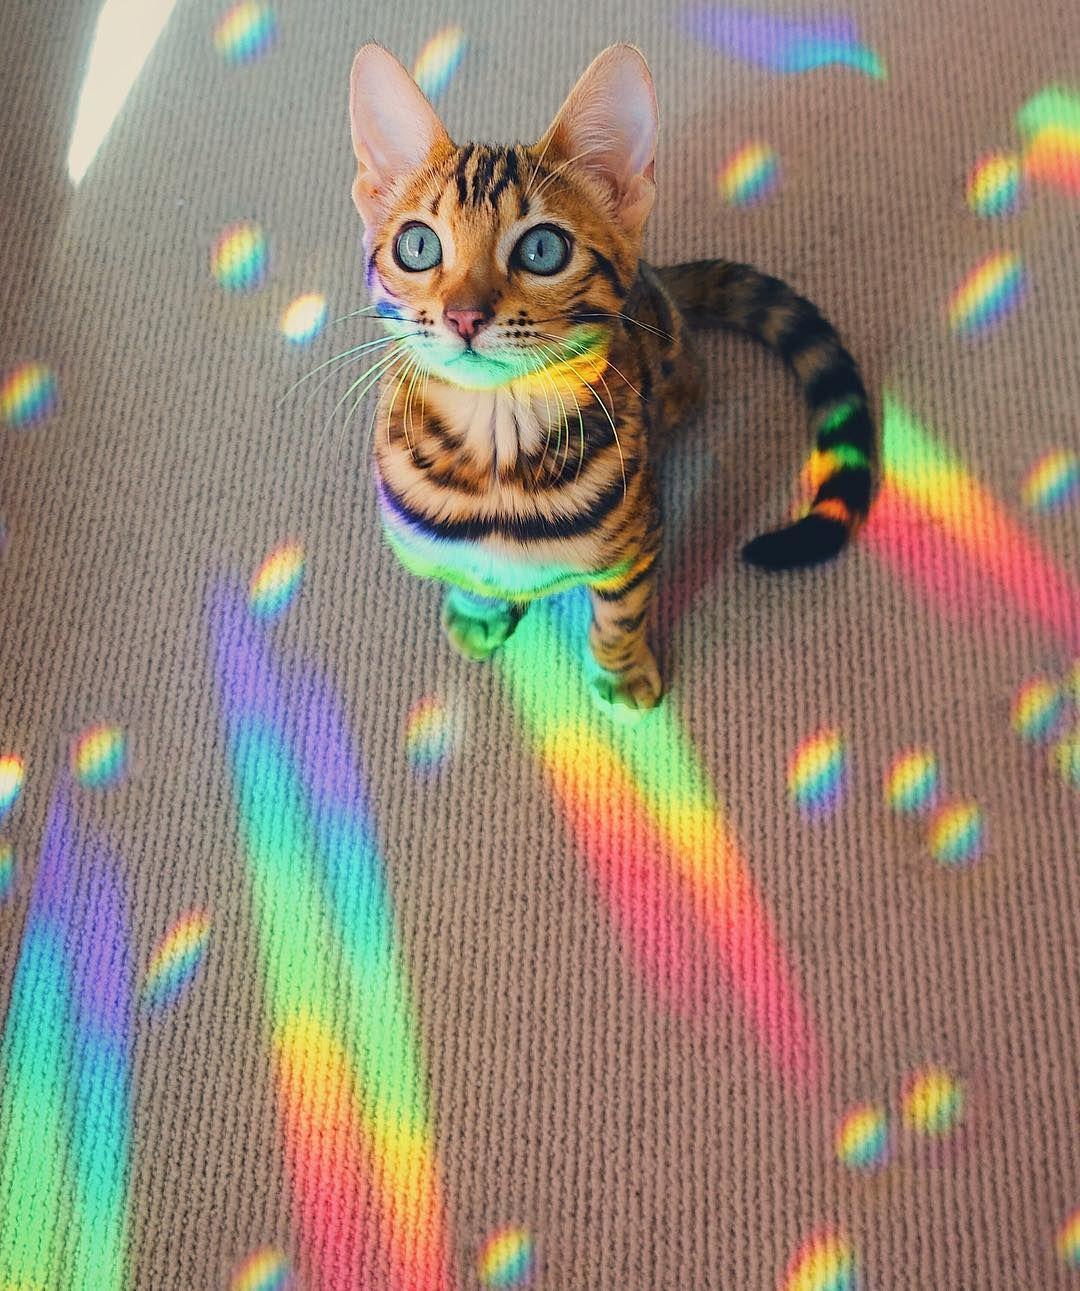 Bengal cat Bengal kitten rainbow iridescent holographic universe